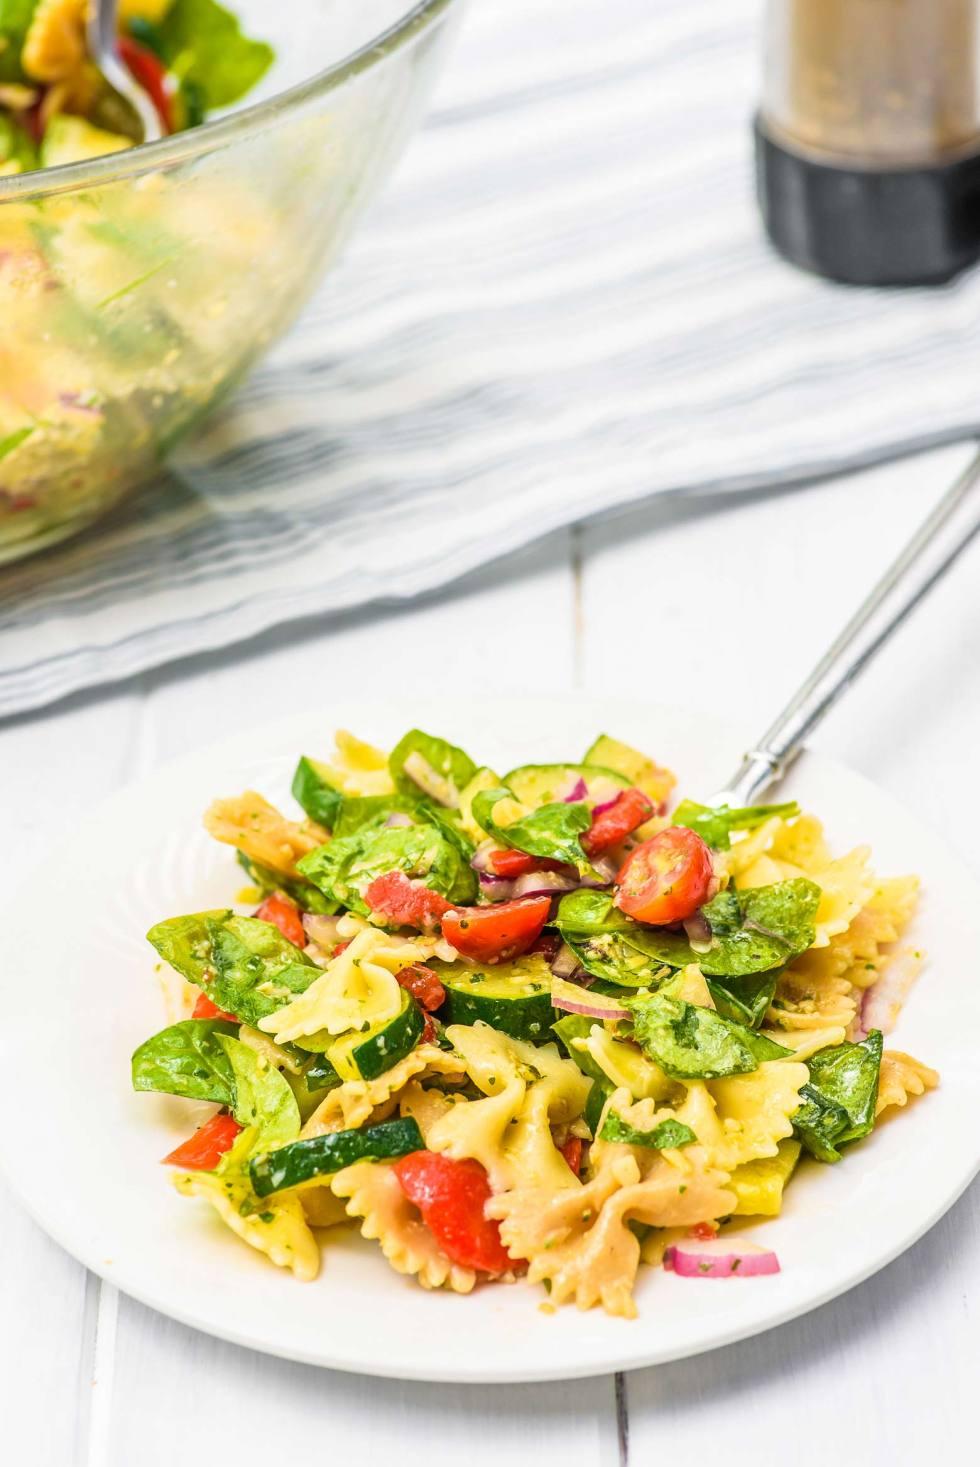 artichoke pasta salad on a plate